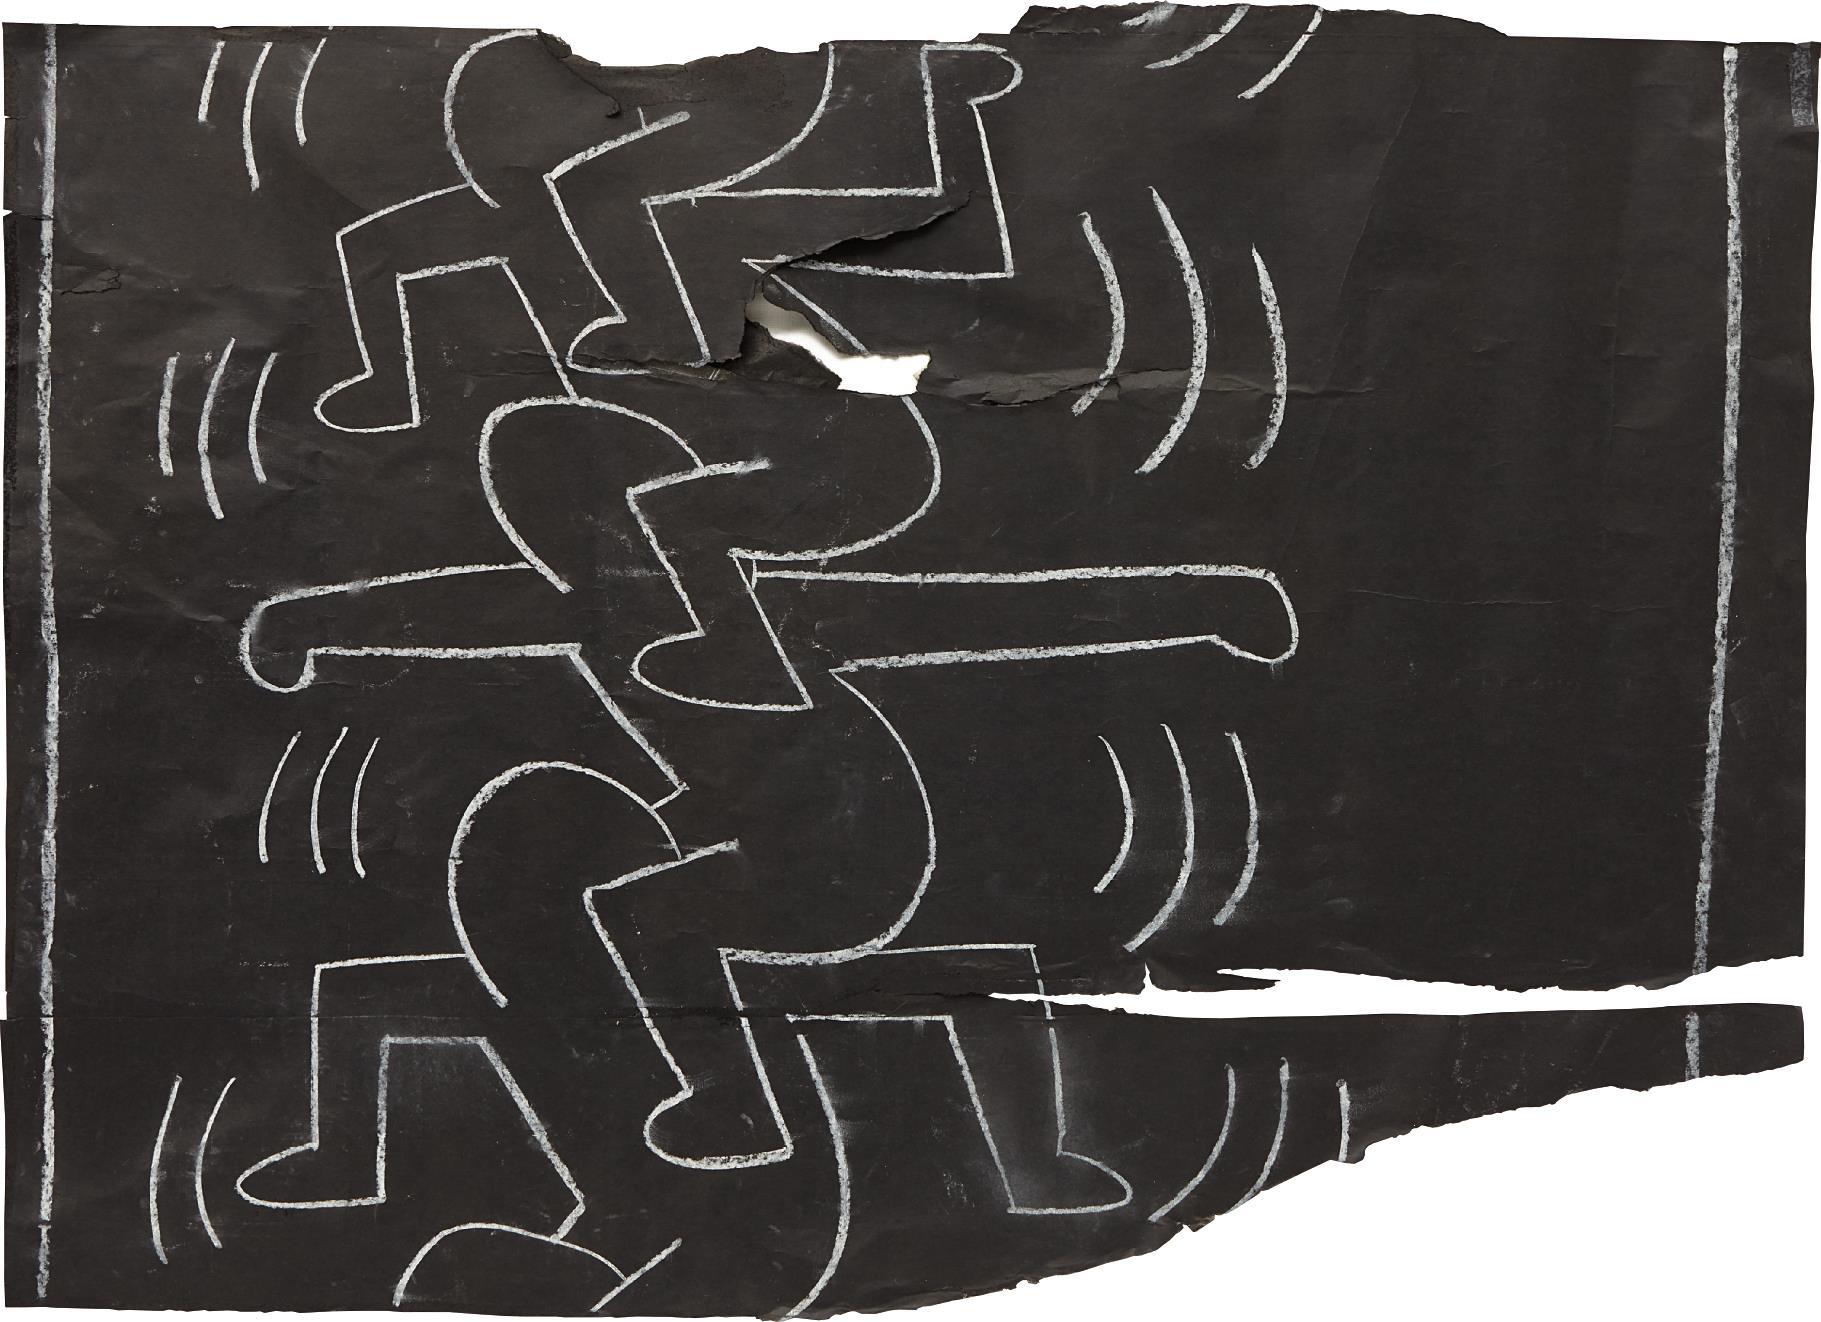 Keith Haring-Totem-1985